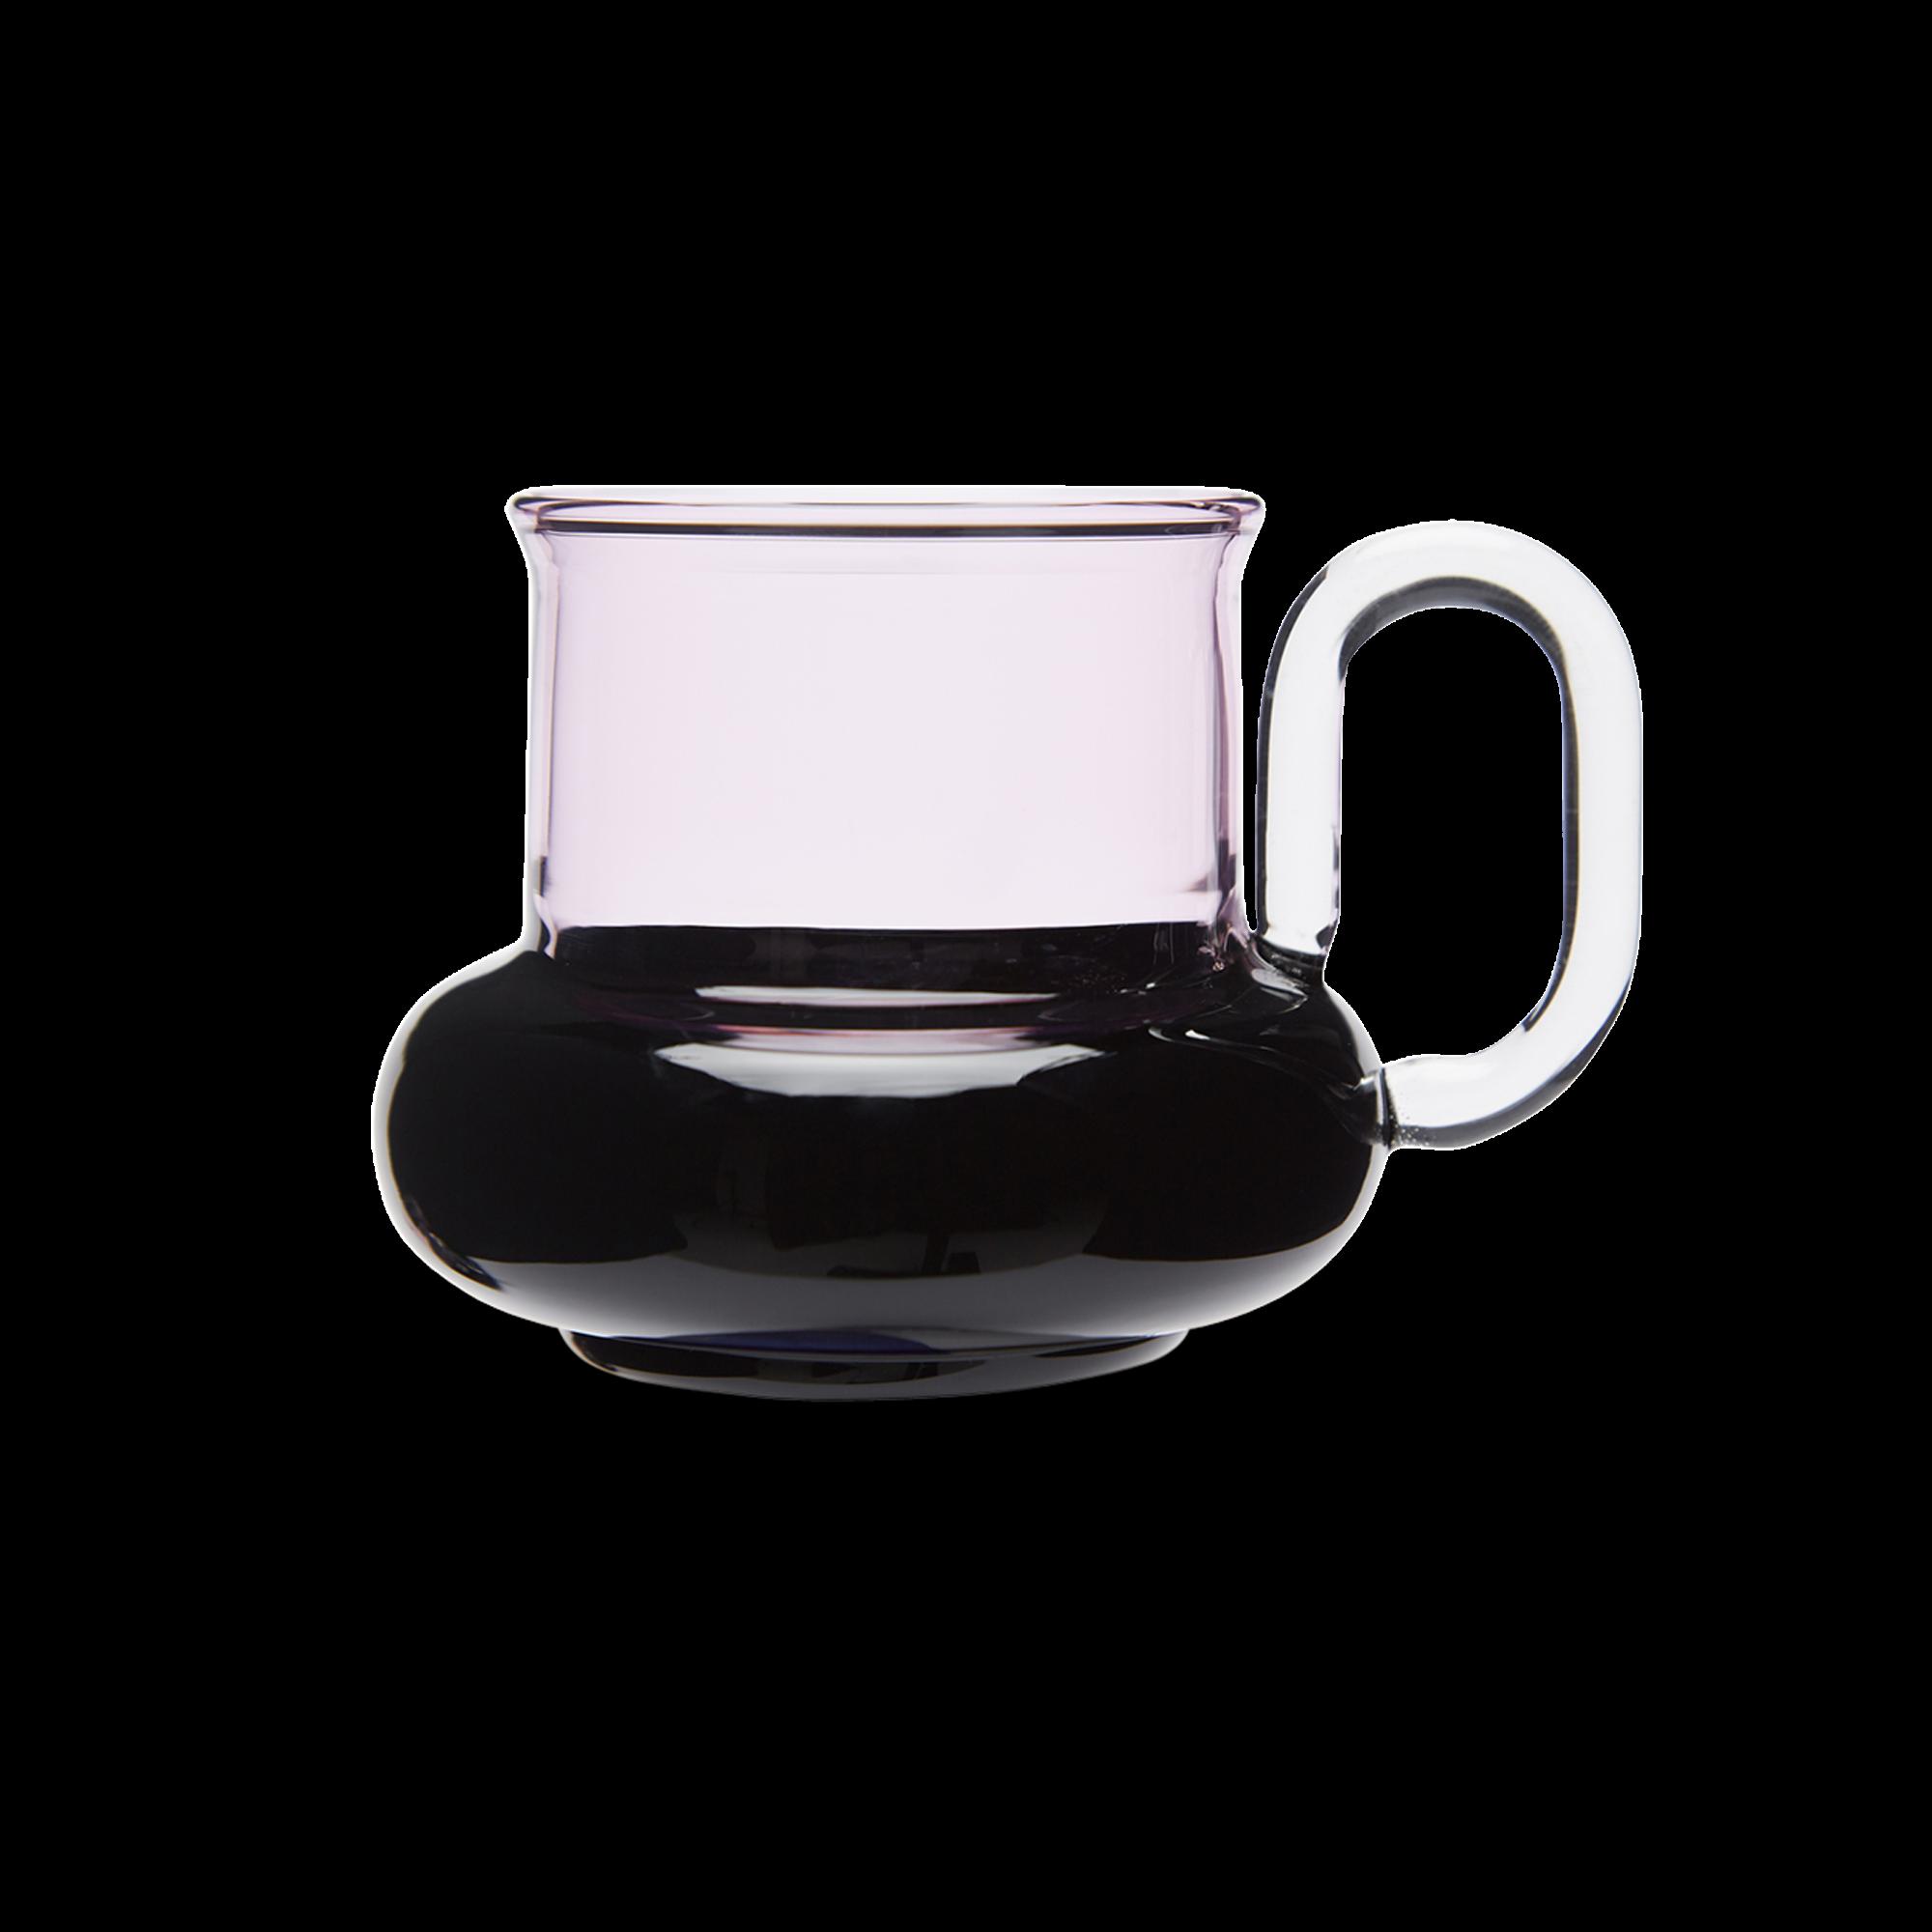 bump-tea-cup-set-1